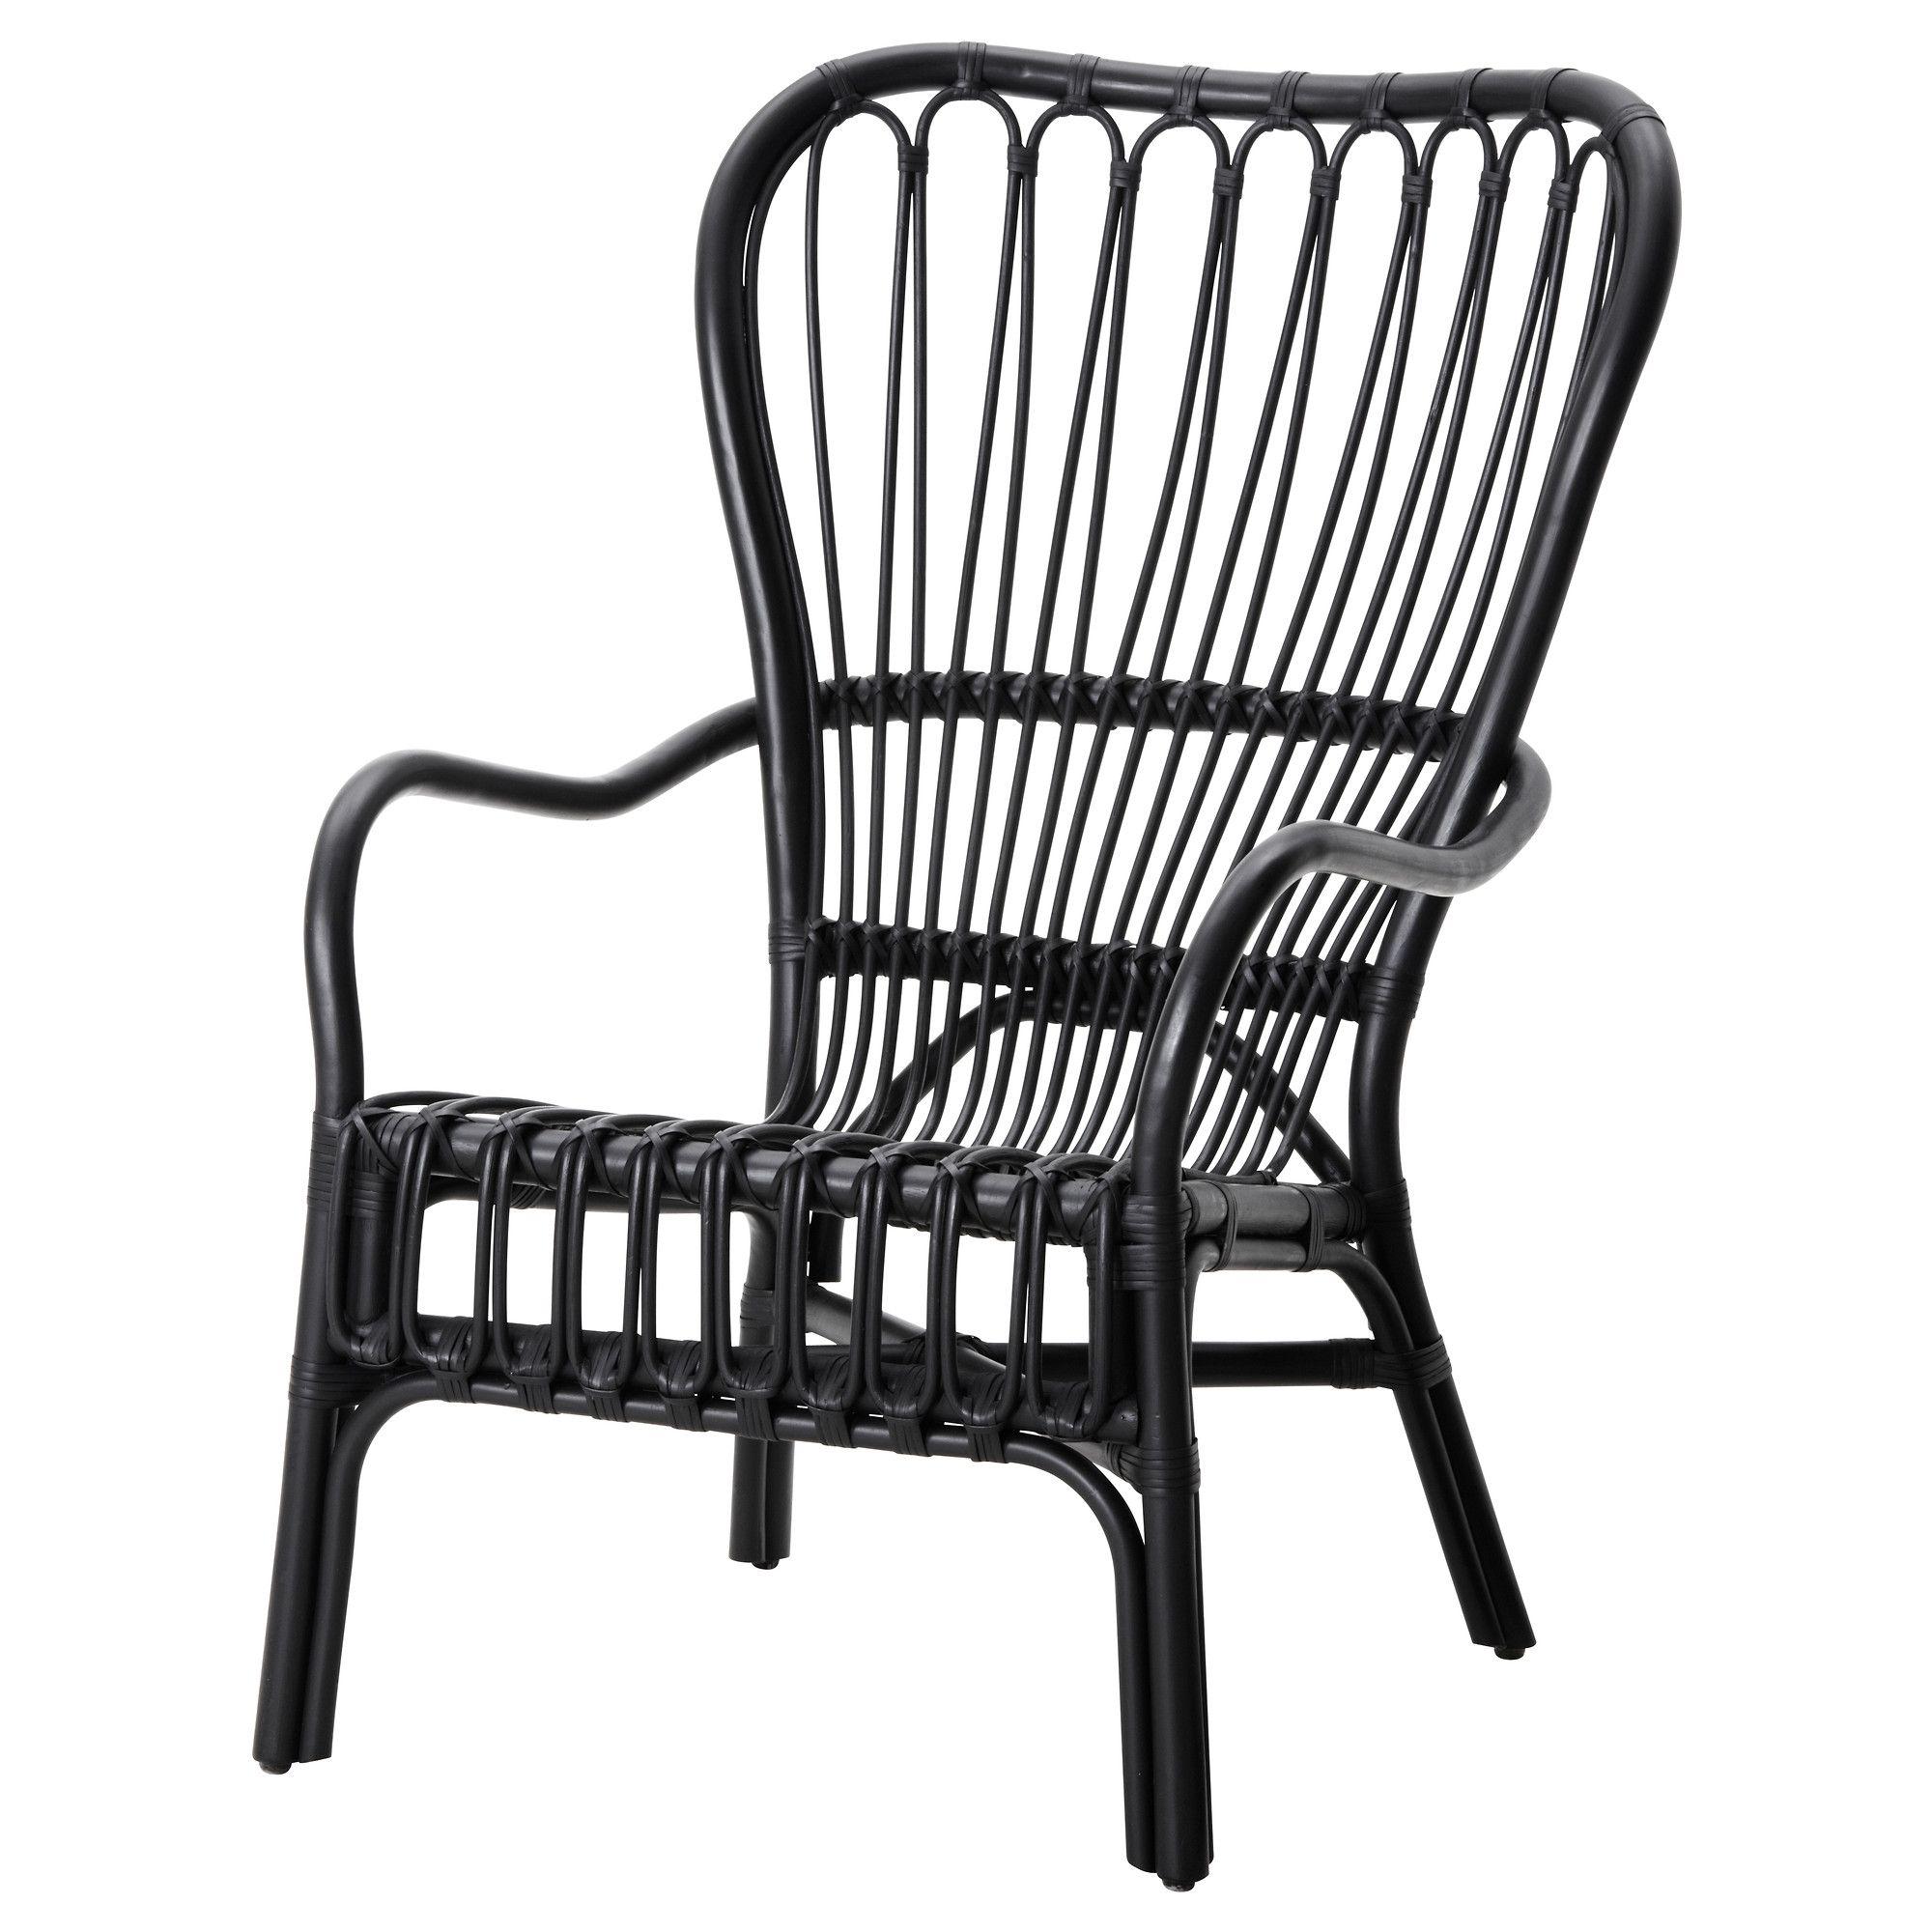 Ikea Australia Affordable Swedish Home Furniture Black Rattan Chair Ikea Armchair Ikea